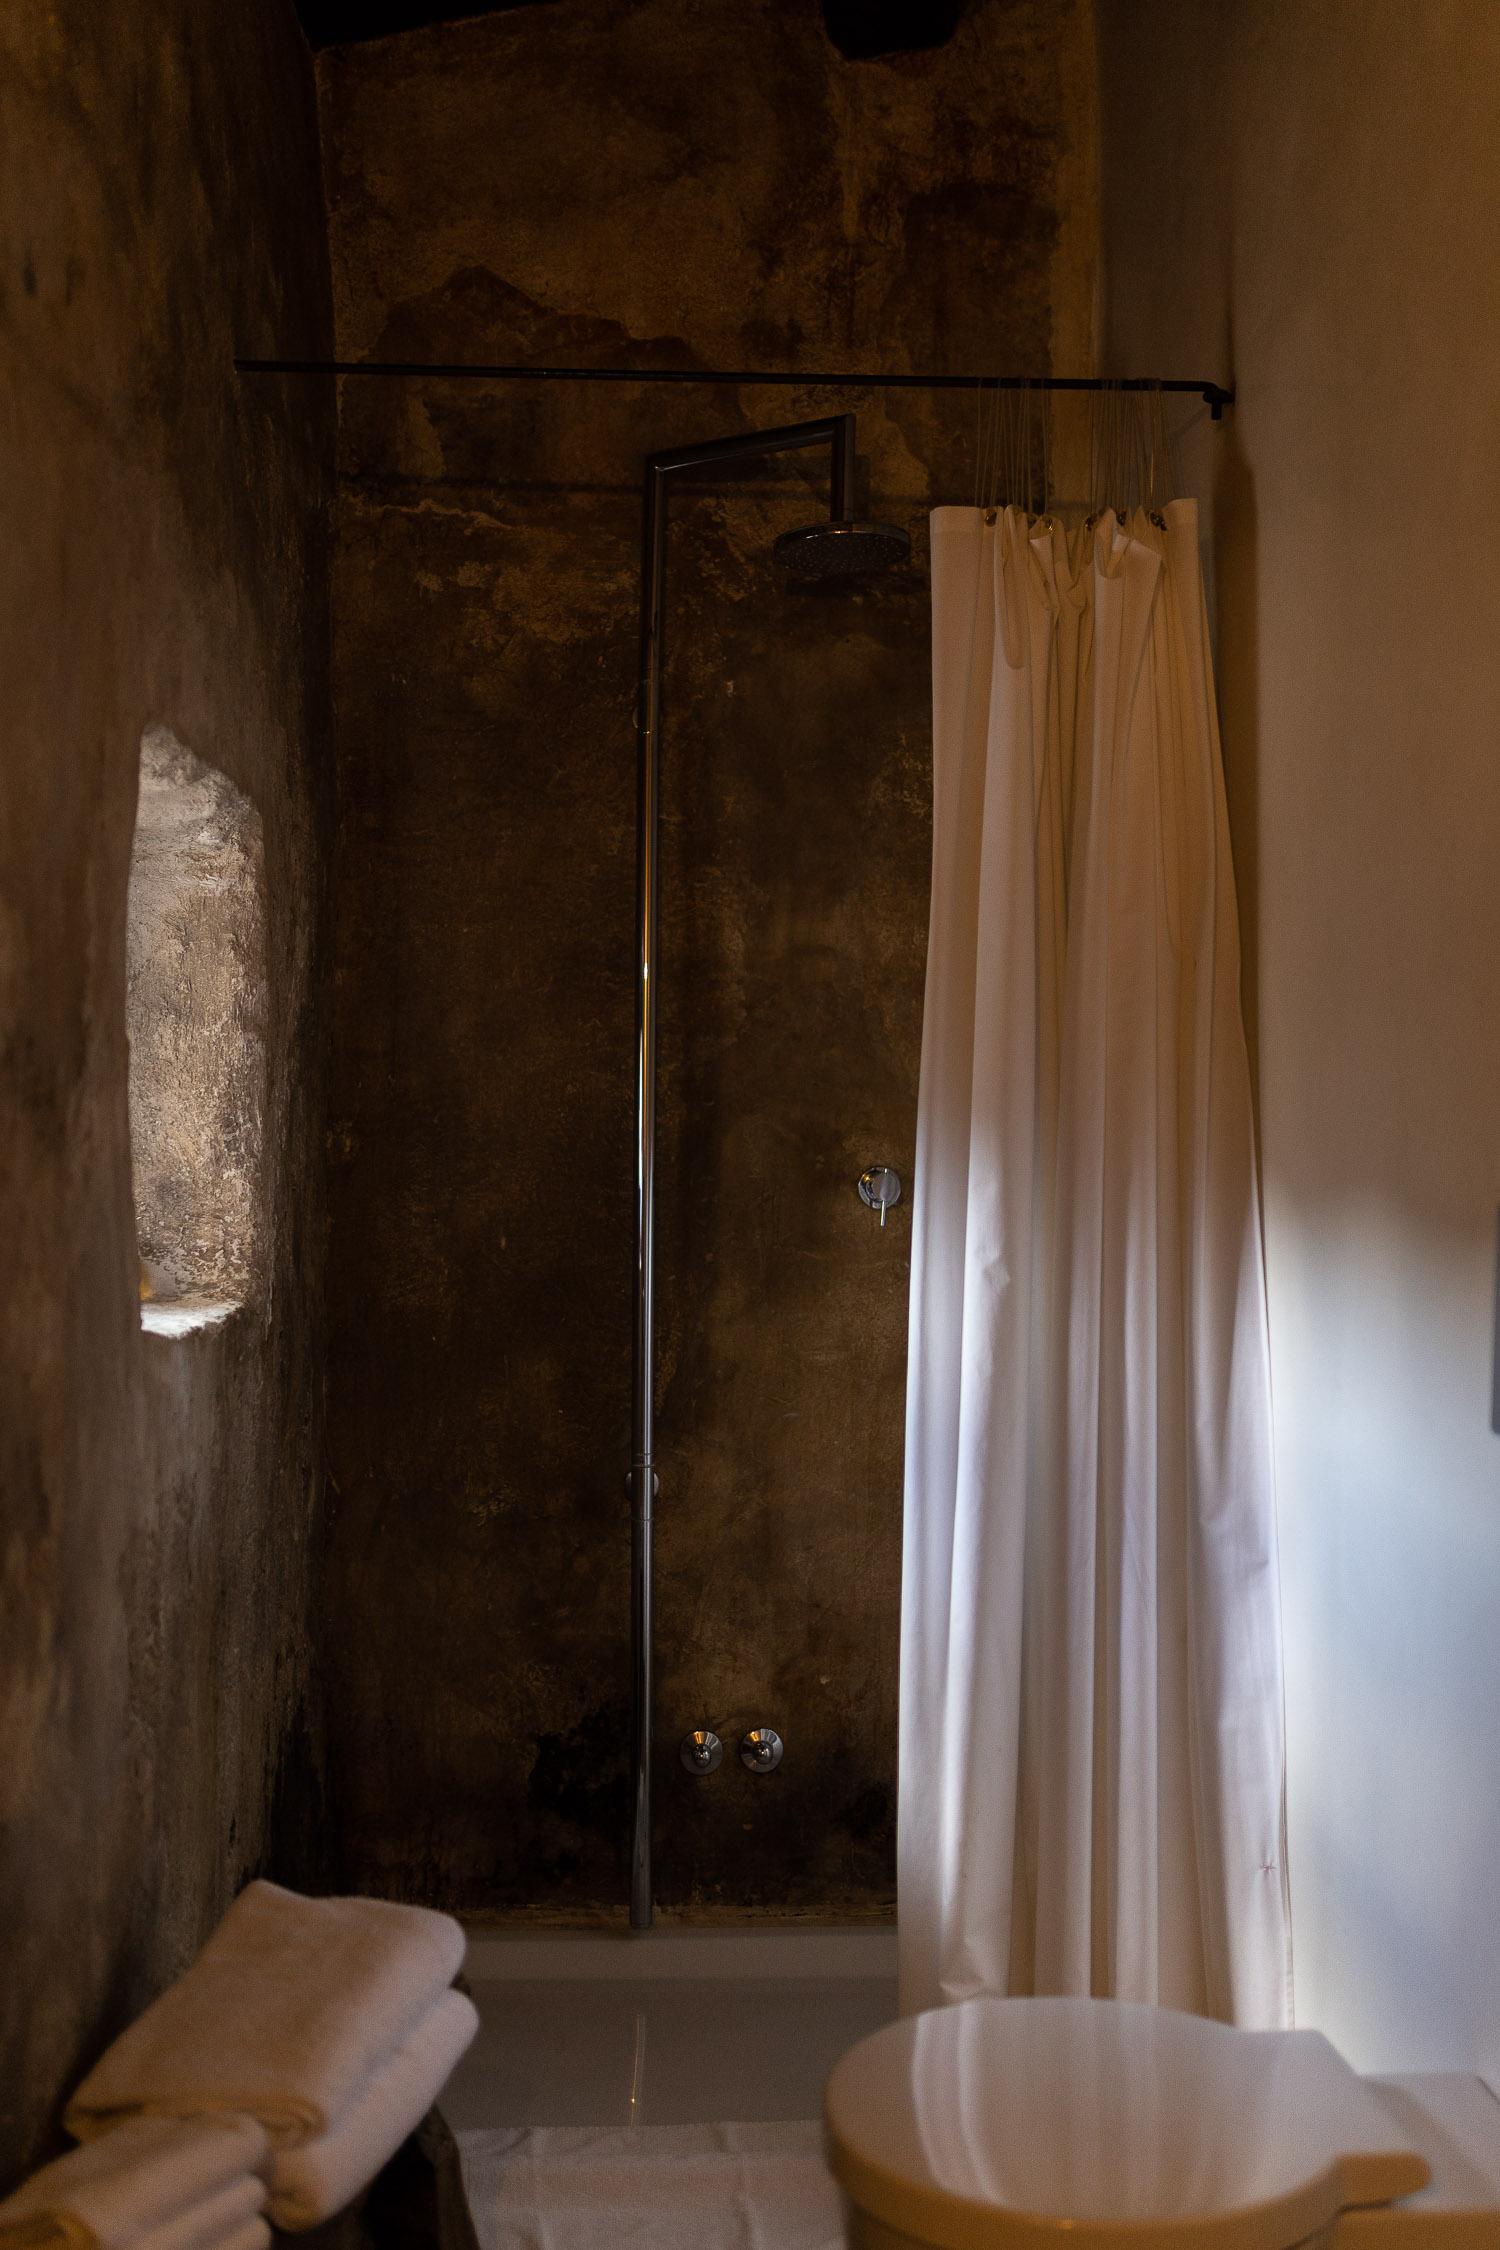 Sextantio-Albergo-Diffuso-bathroom-Abruzzo-5548.jpg